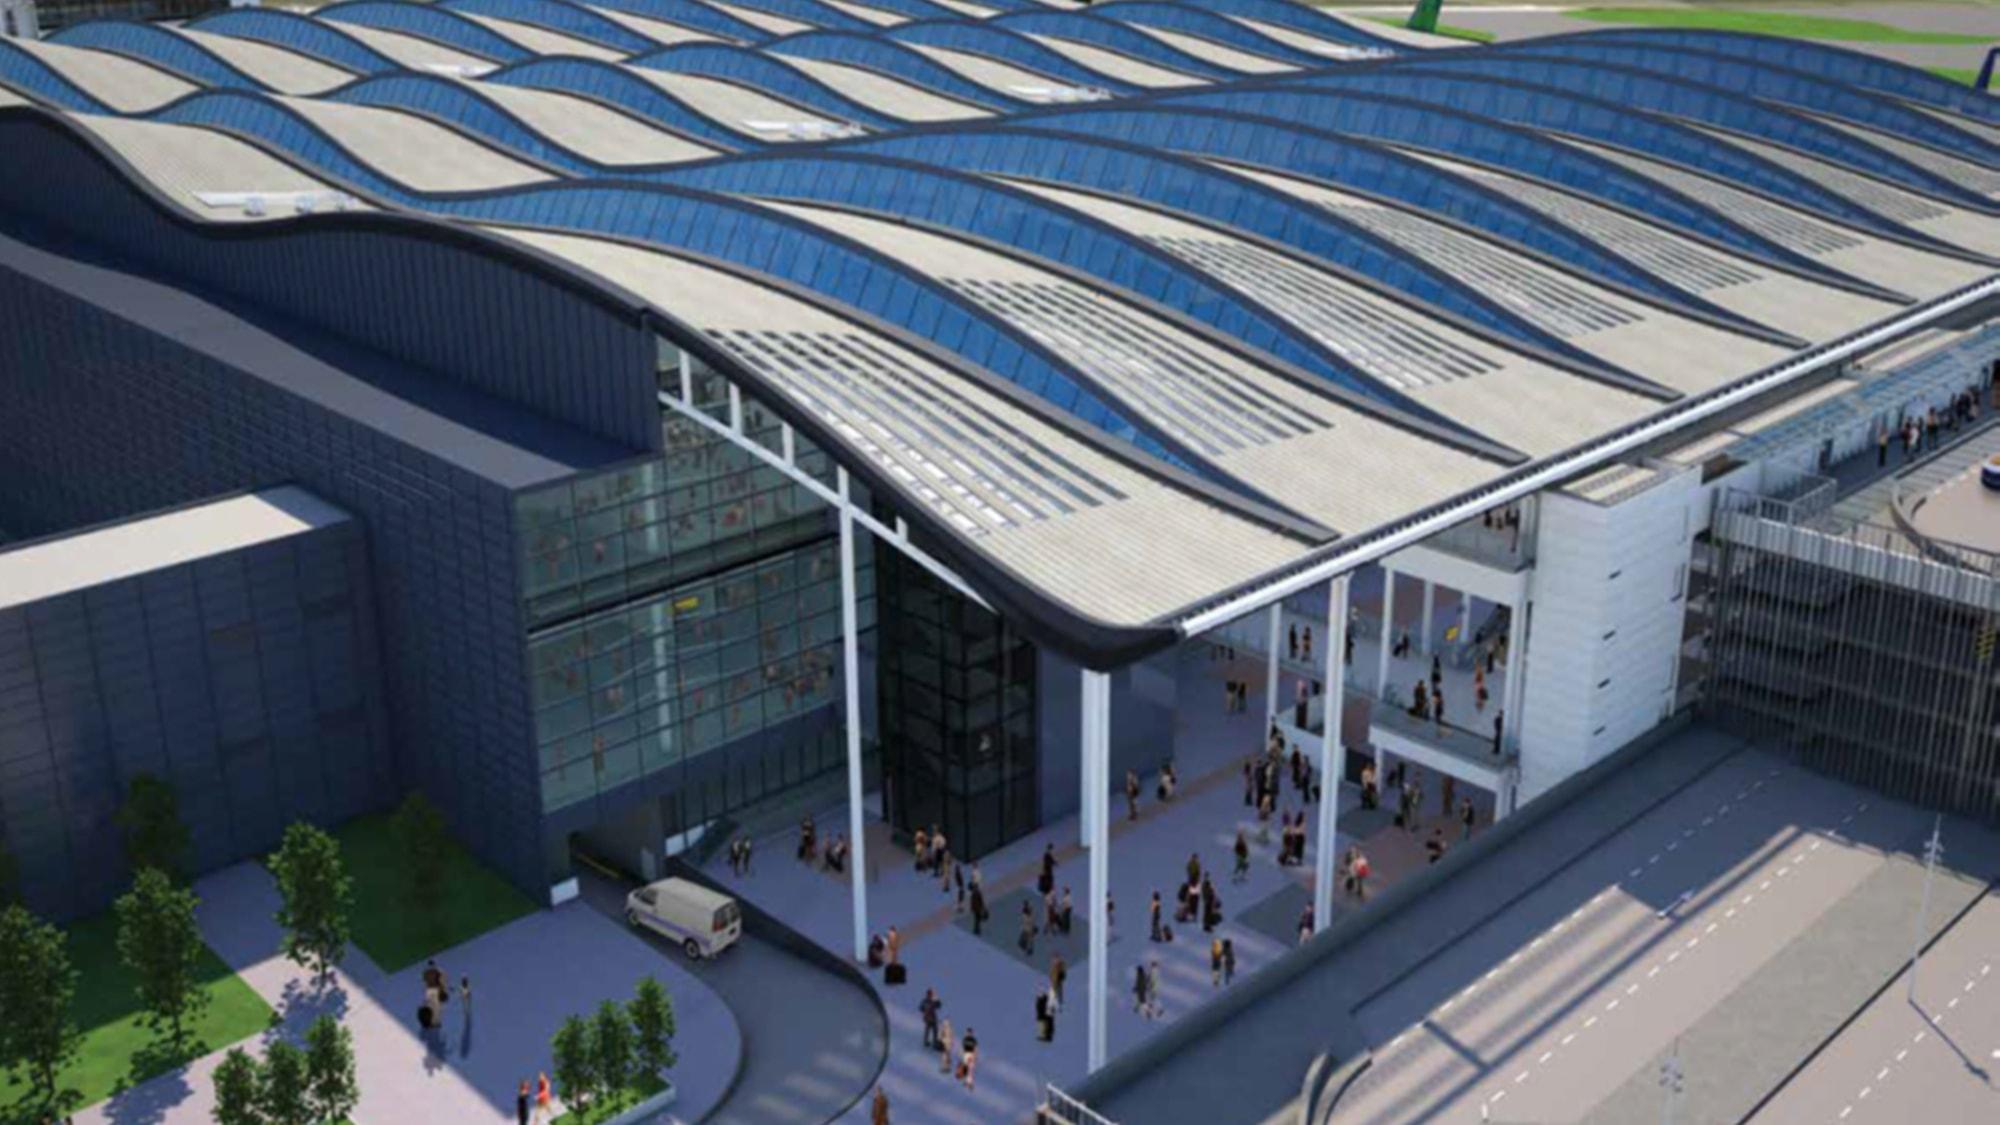 heathrow-terminal-2-concourse-image-1-min